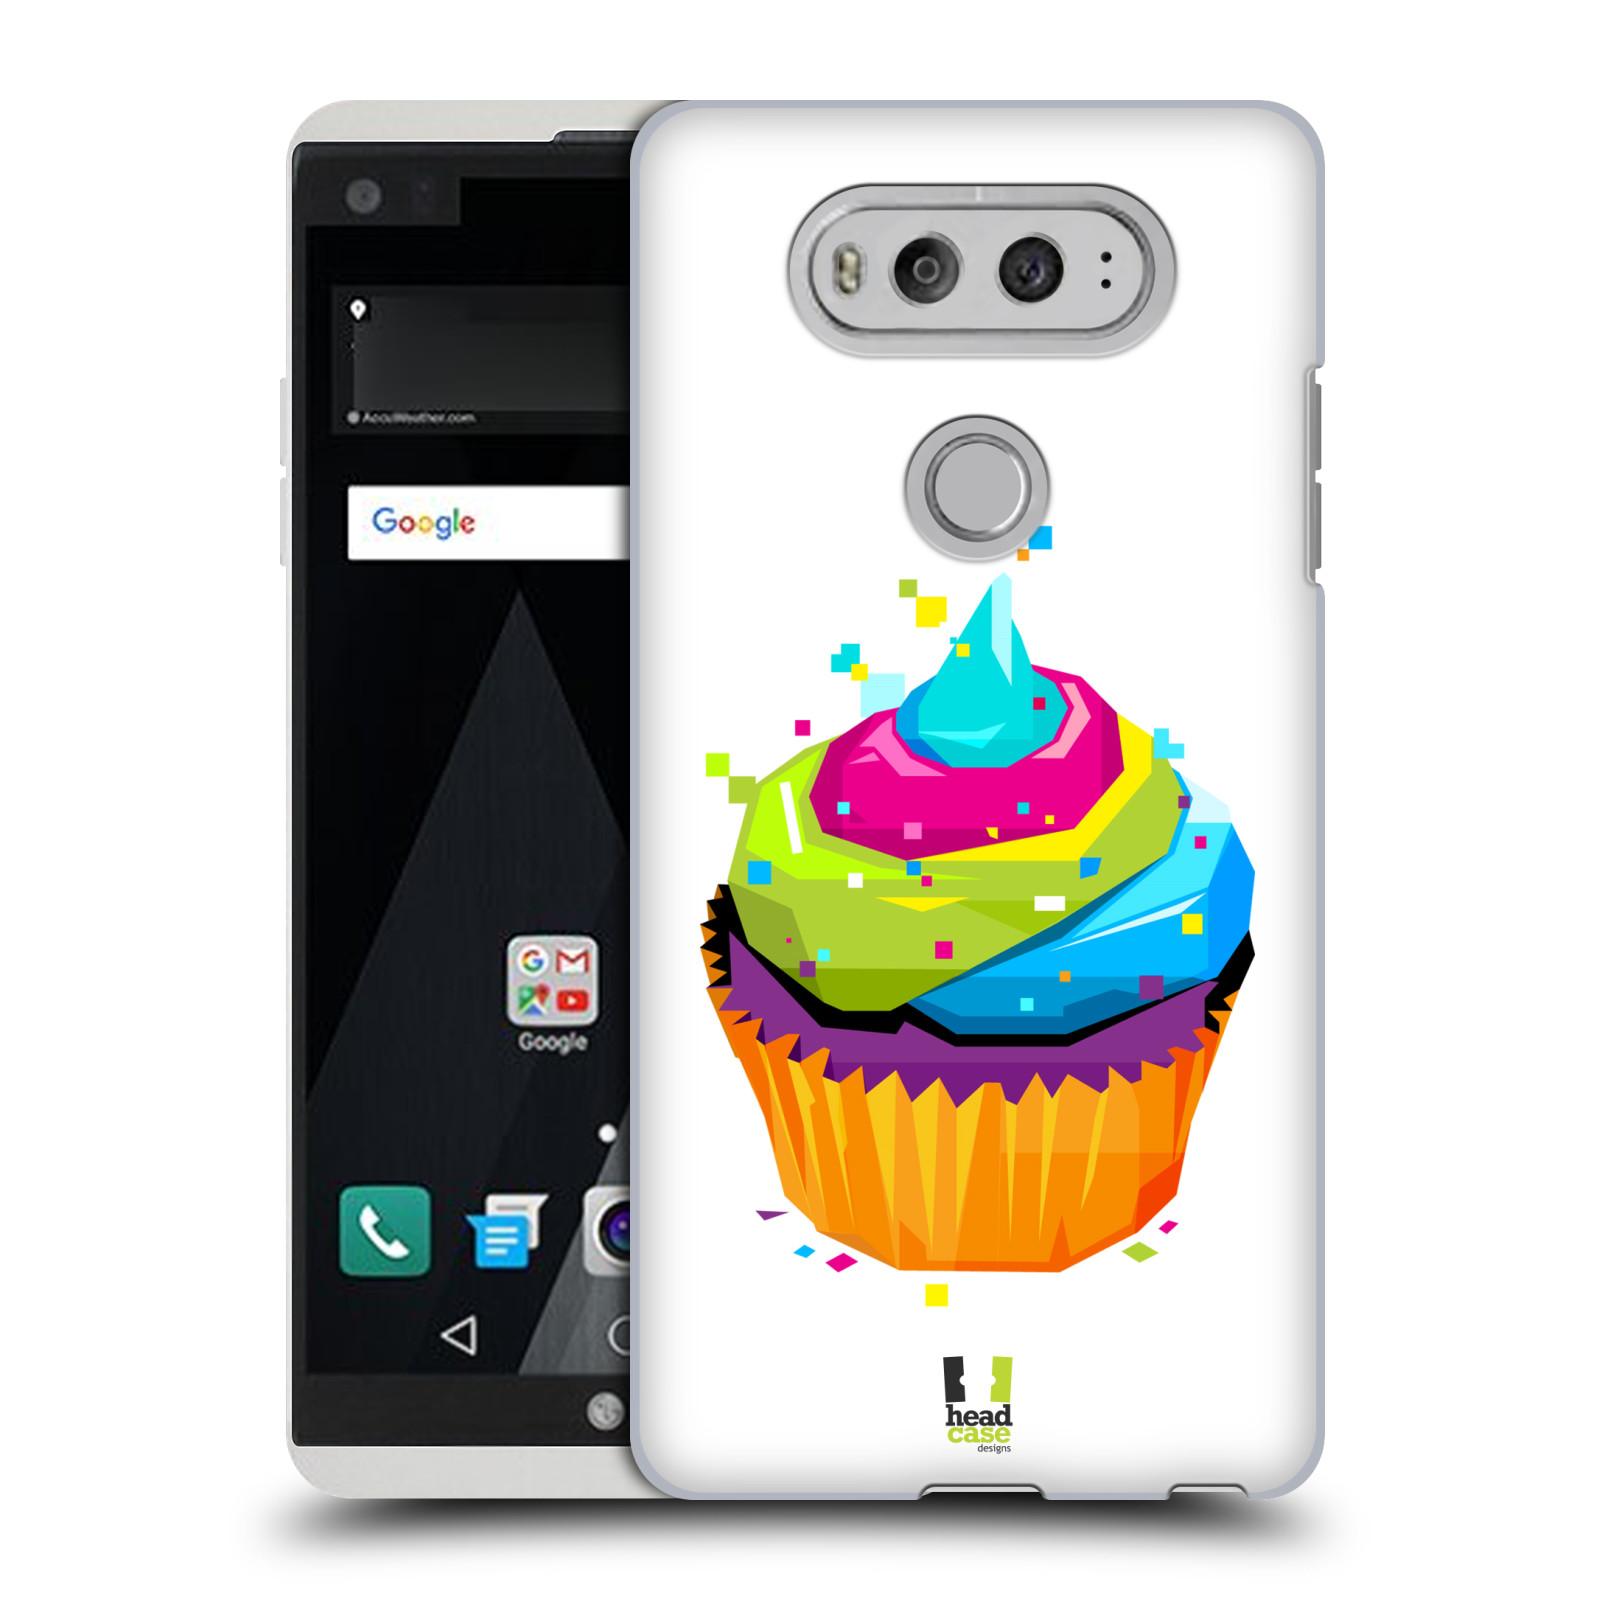 HEAD CASE plastový obal na mobil LG V20 vzor POP ART kubismus dortík